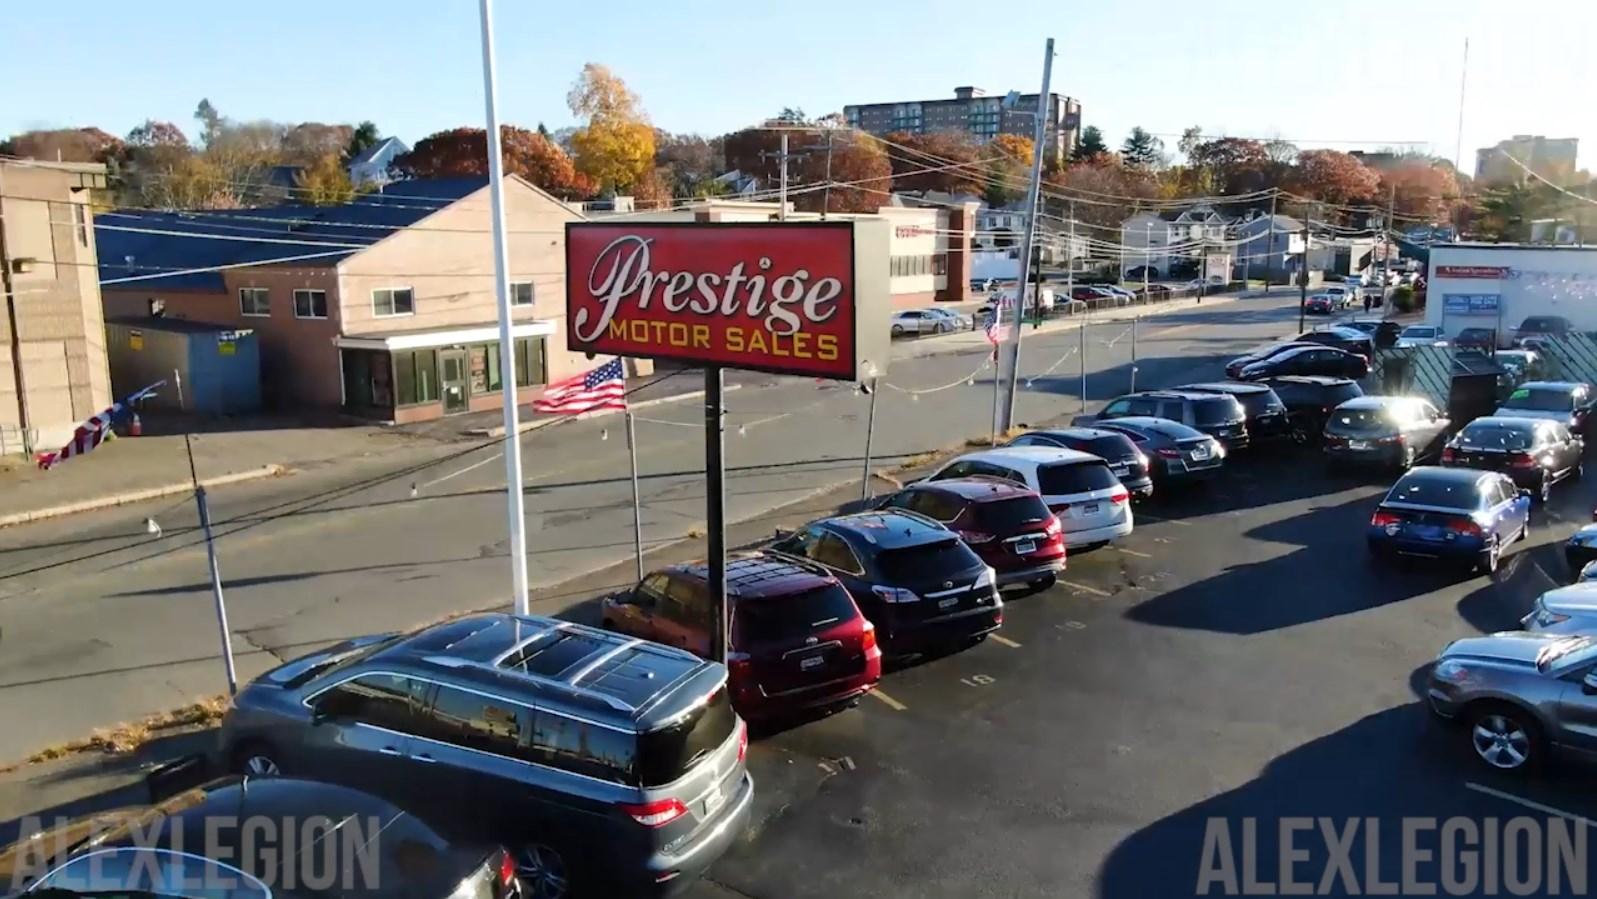 Prestige motors. USA. Реклама